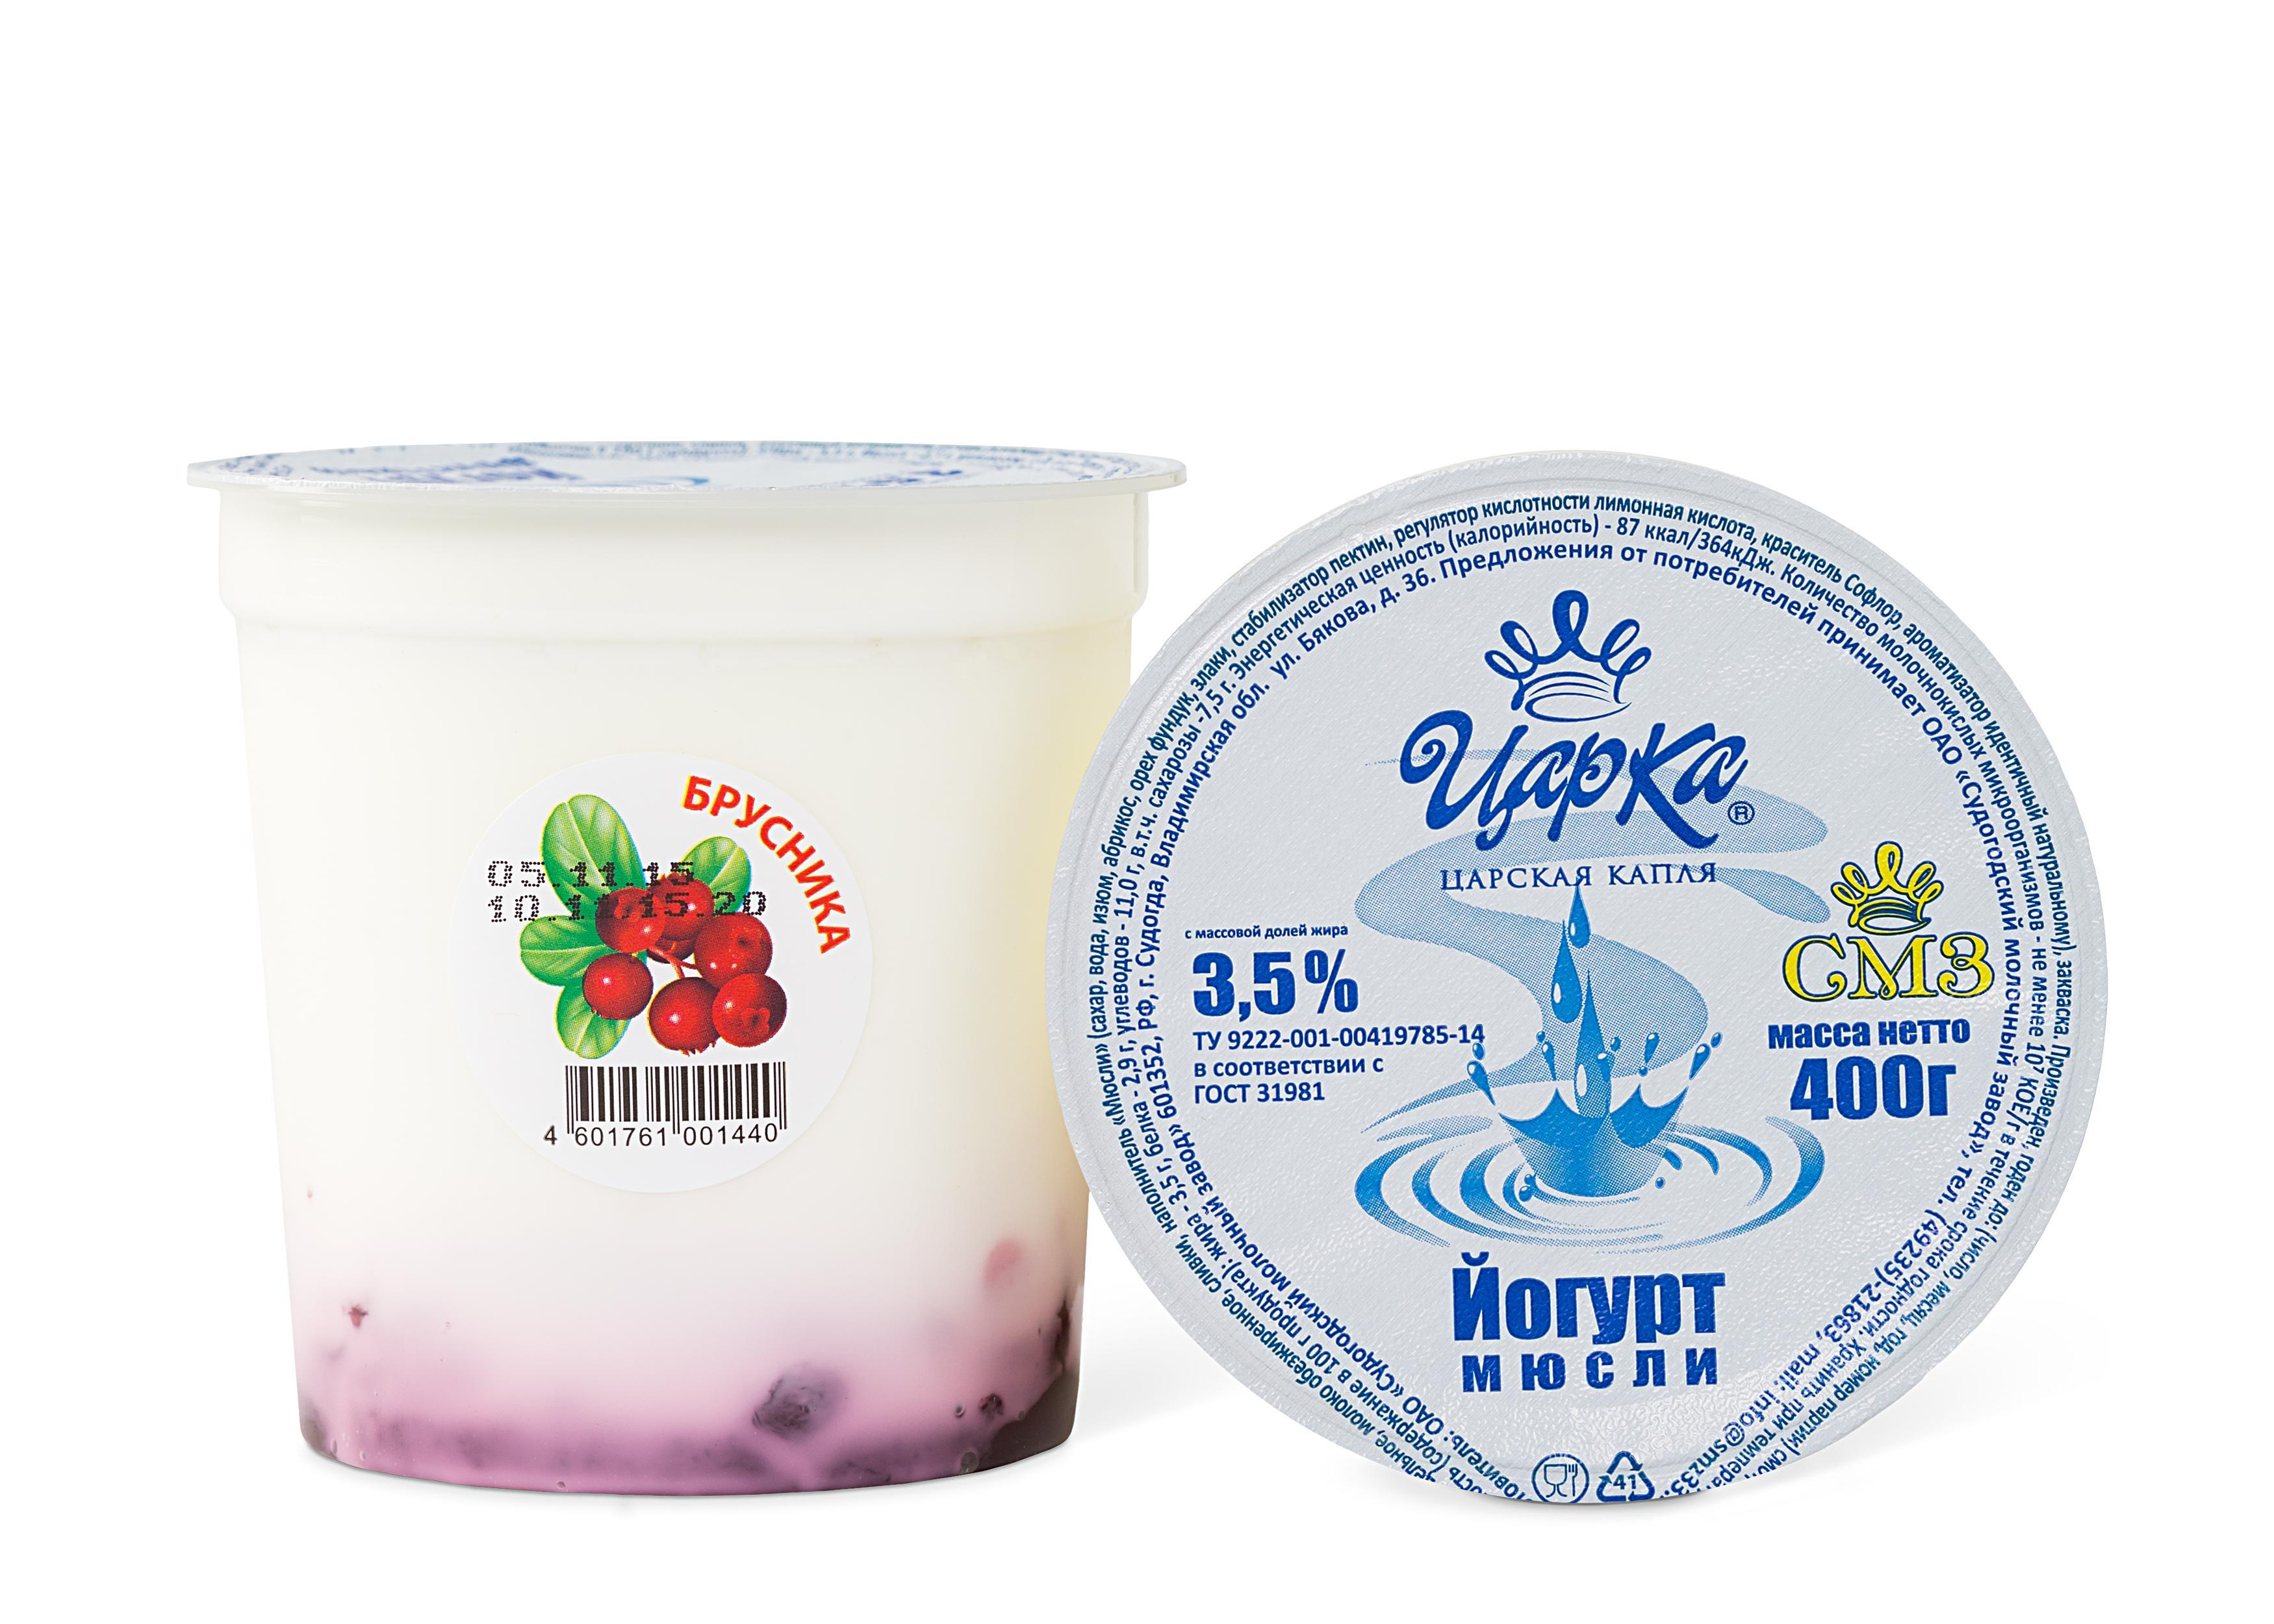 Йогурт ЦарКа Брусника 3,5%